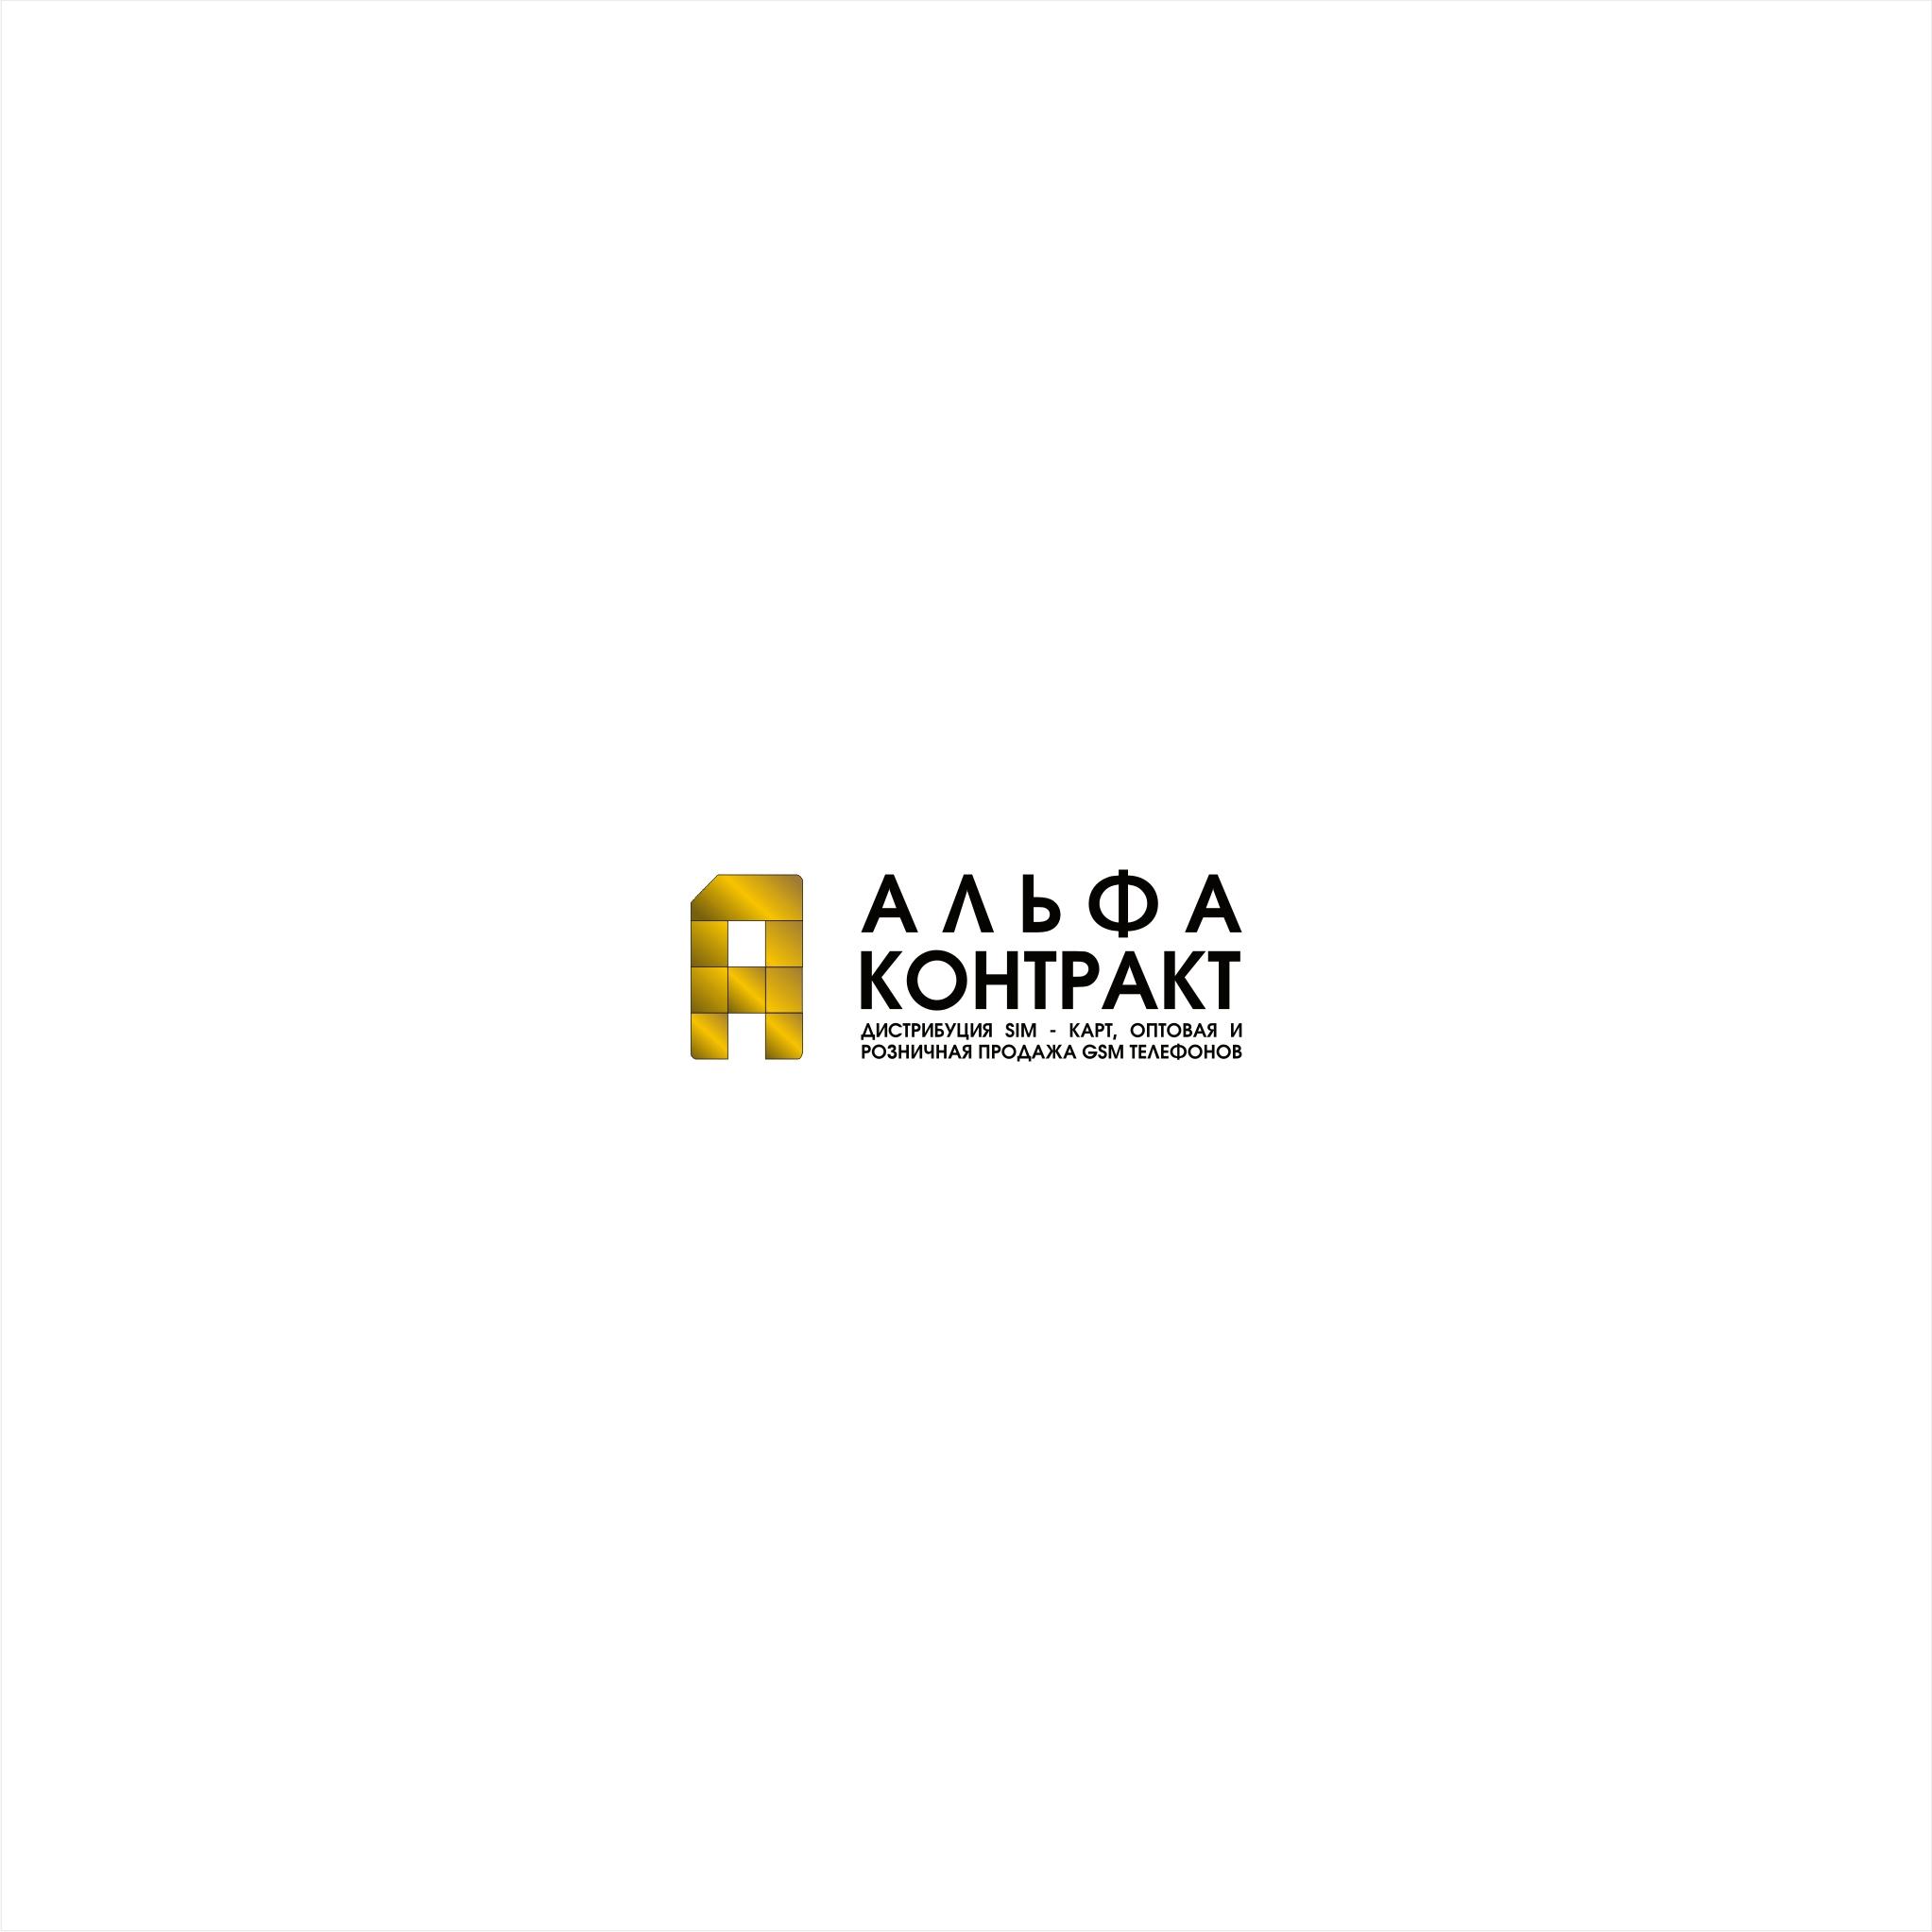 Дизайнер для разработки логотипа компании фото f_8325bf9342f7b1a5.jpg